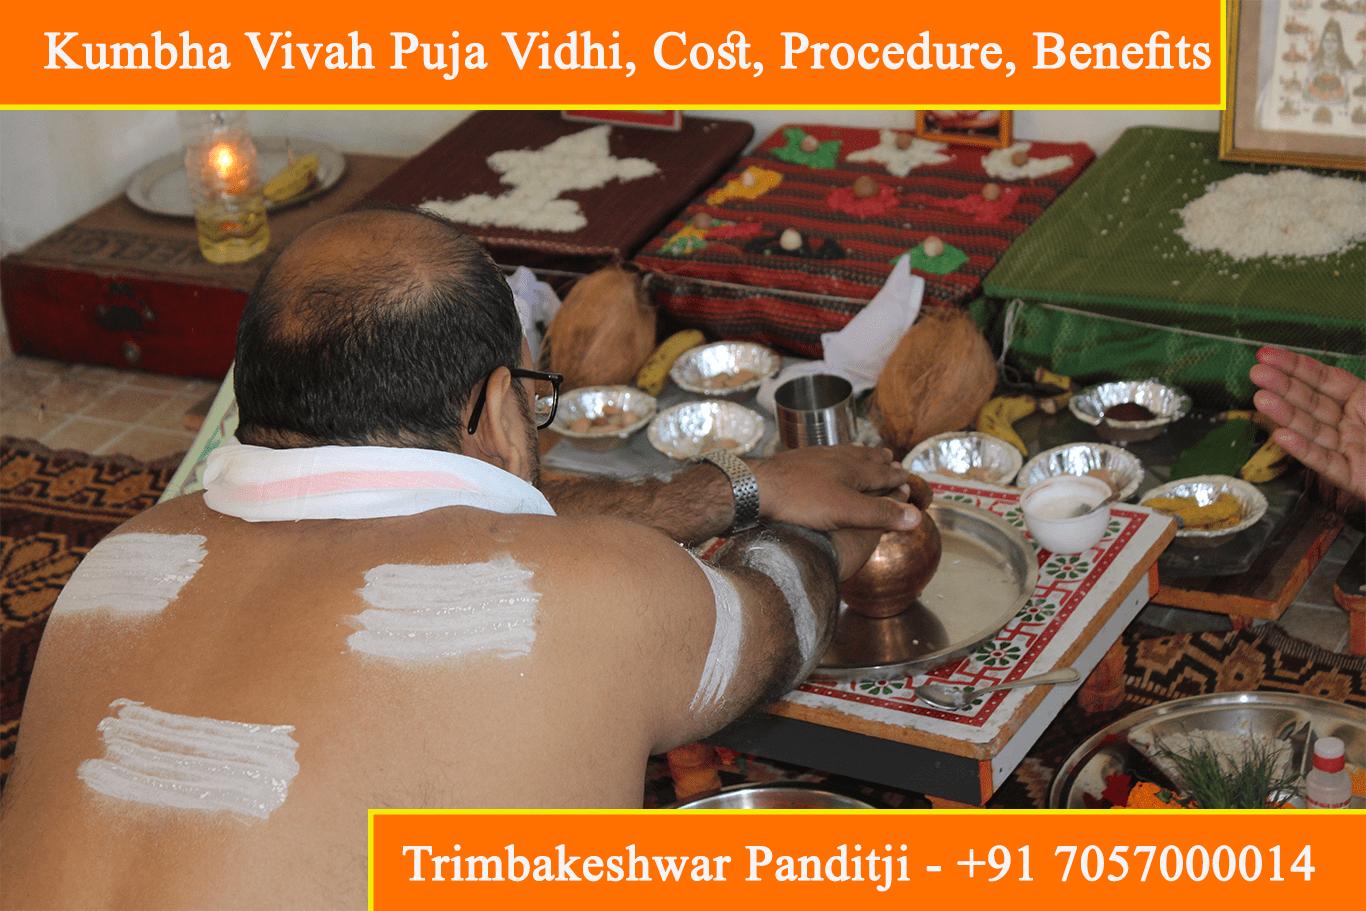 Kumbha Vivah Puja Vidhi, Cost, Procedure, Benefits and Reasons